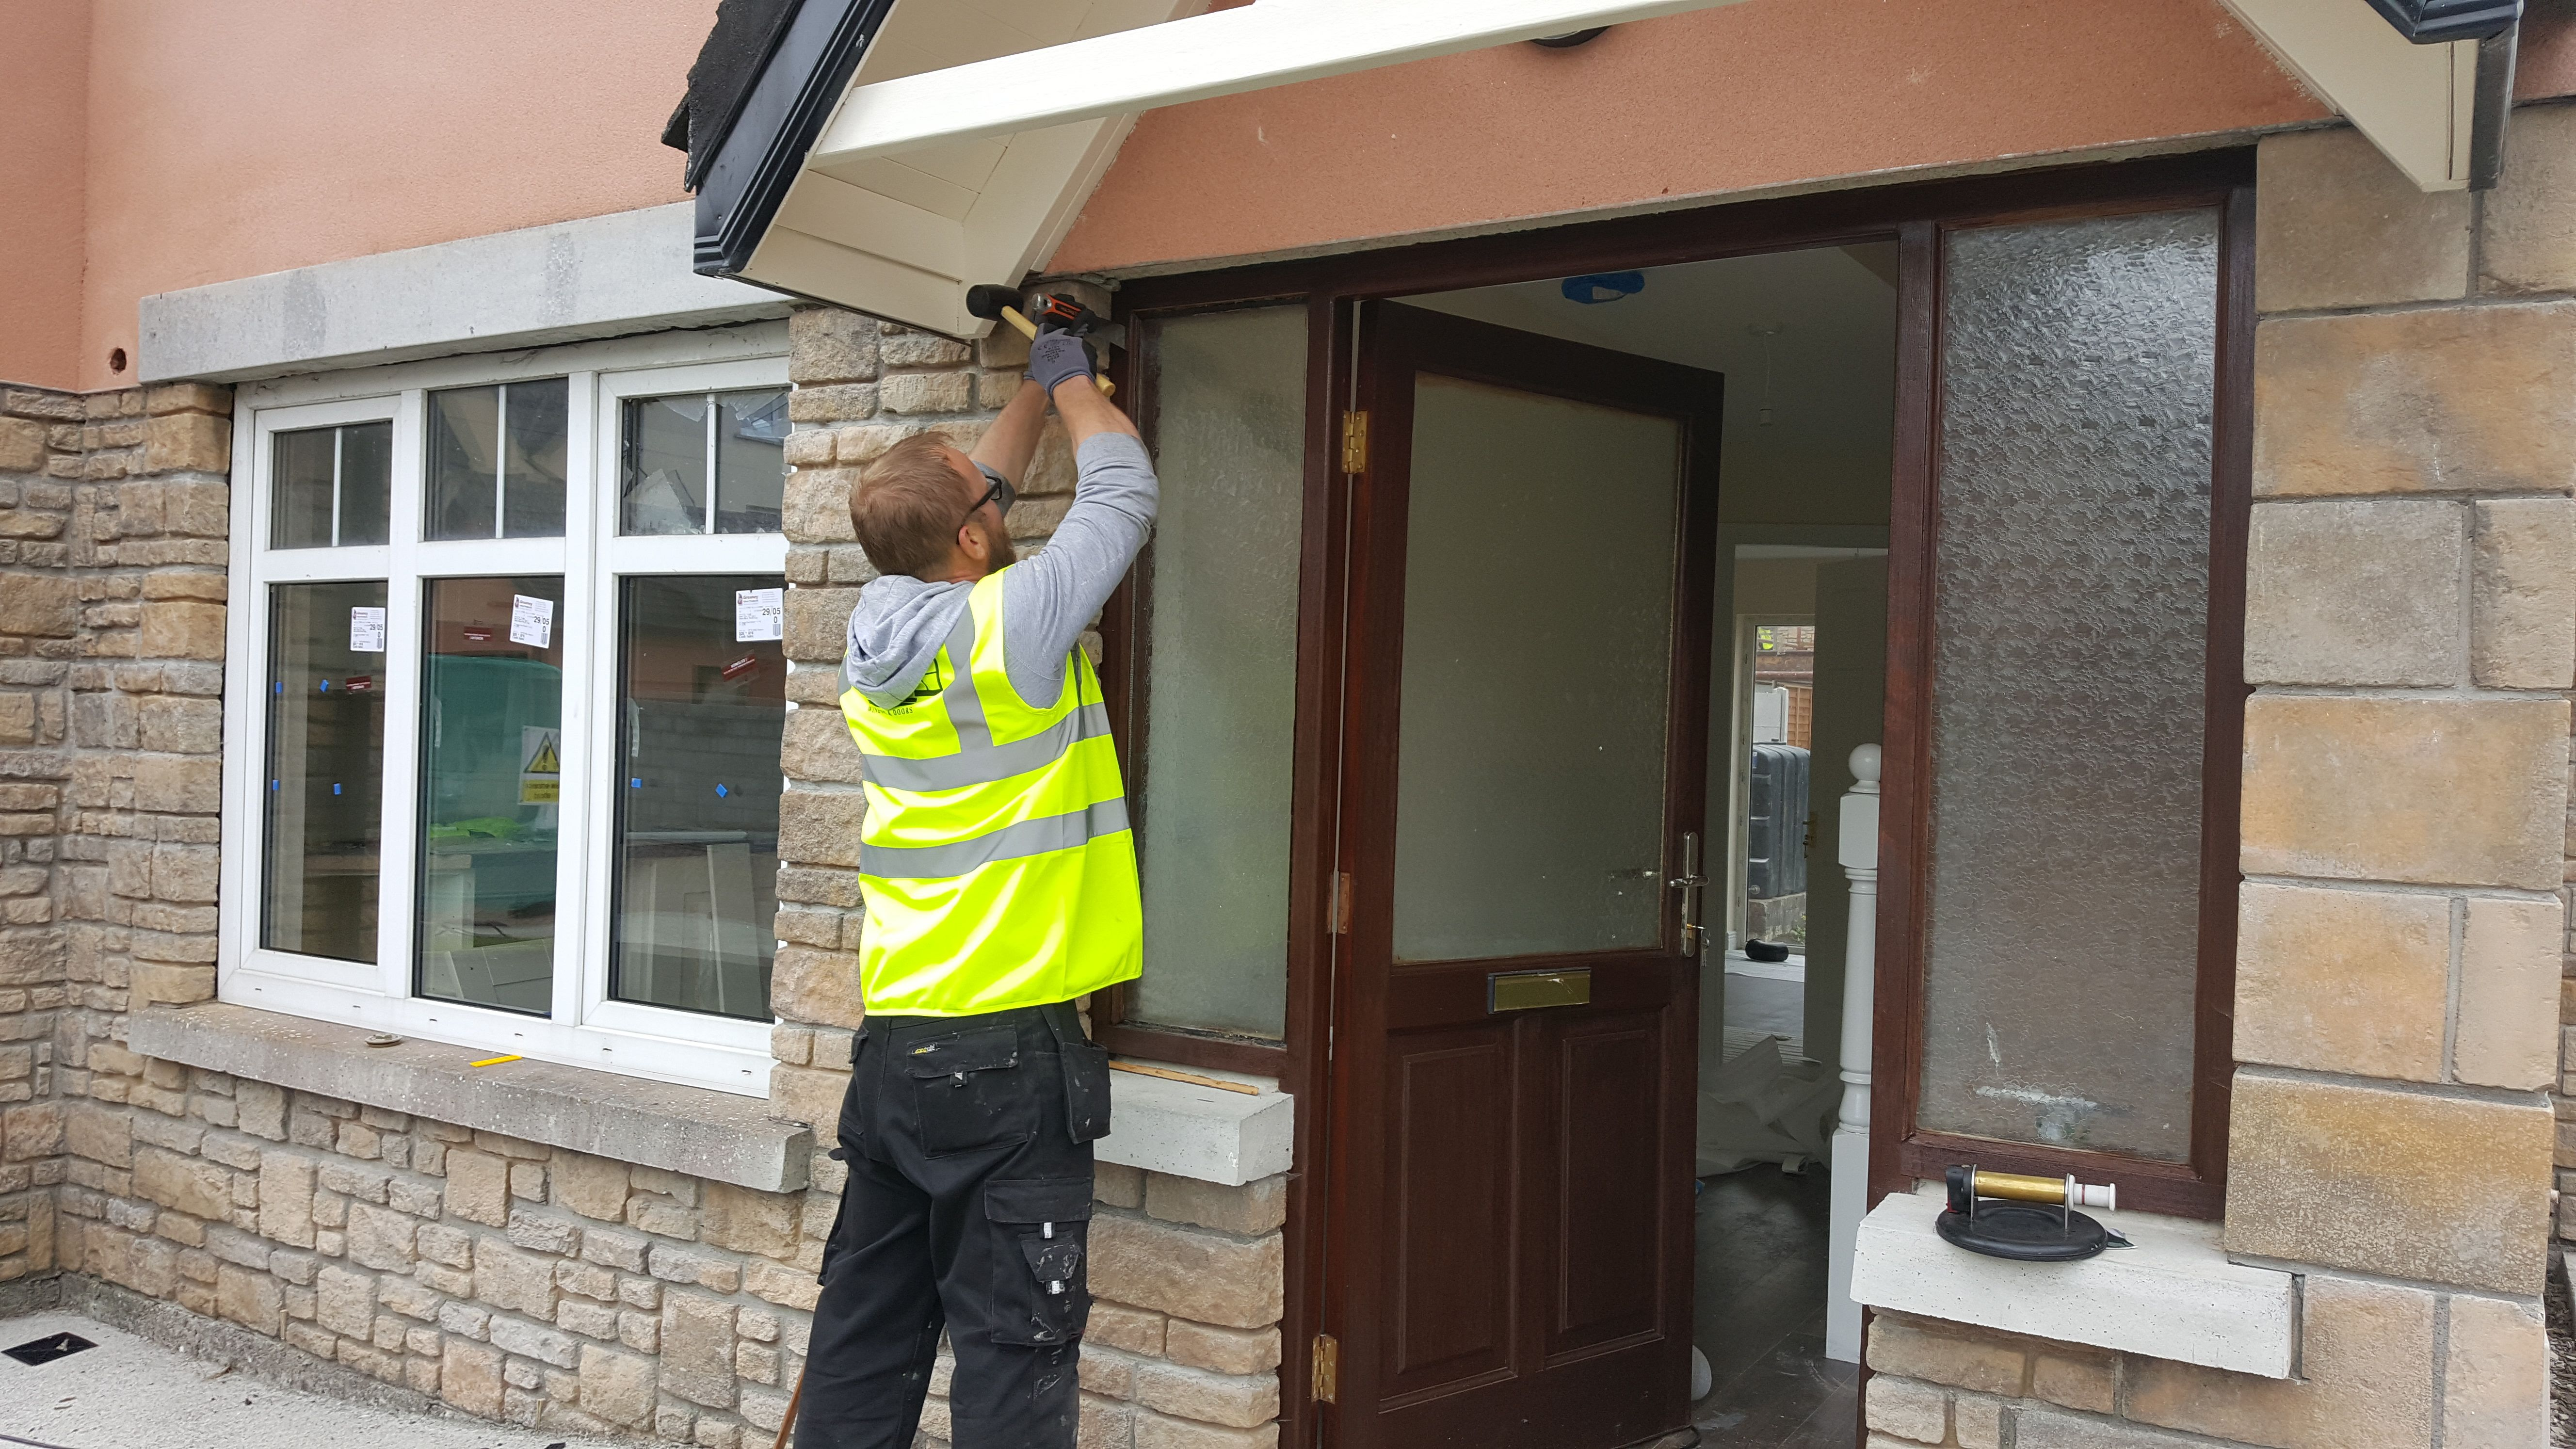 Gable end window ideas  dubest door and window repair parts dbestdoorswindowsrepairs on